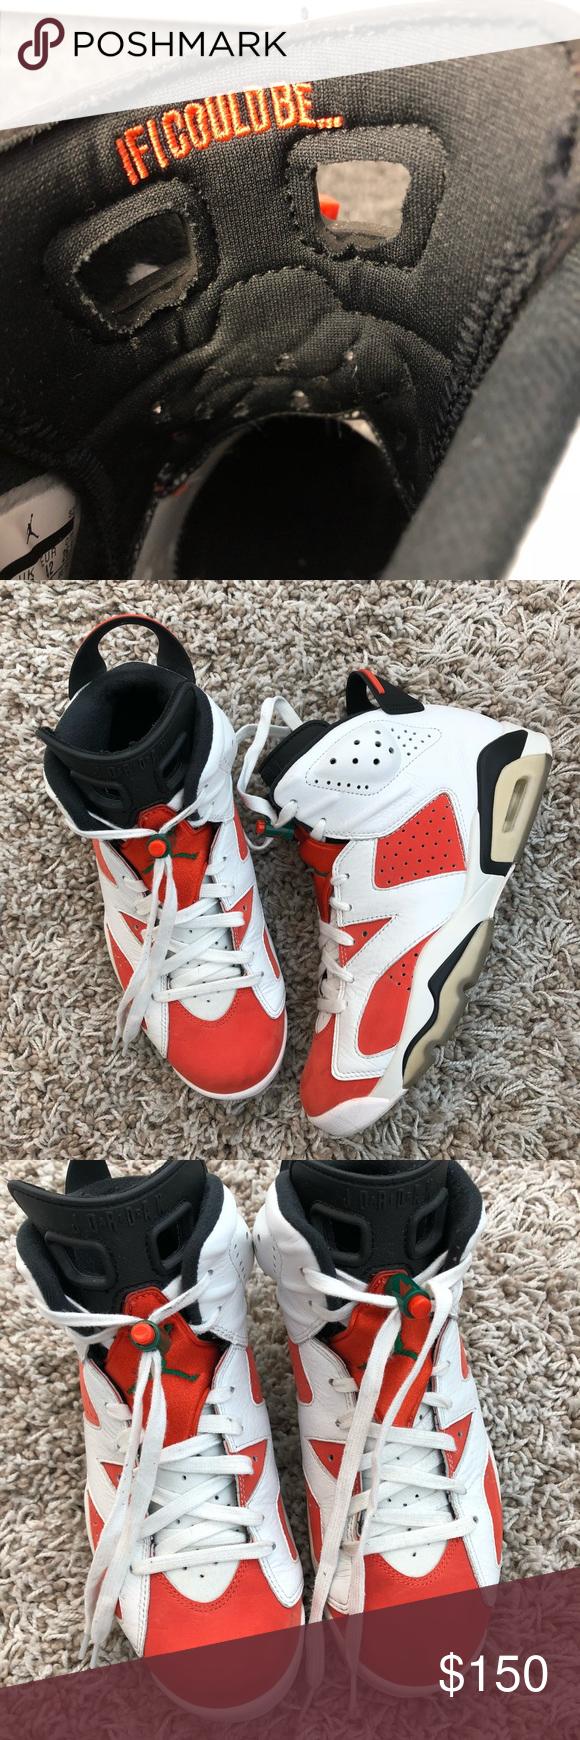 1a7316365dd76d Air Jordan 6 Retro The Jordan 6 Gatorade. Light wear. No trades Jordan  Shoes Sneakers